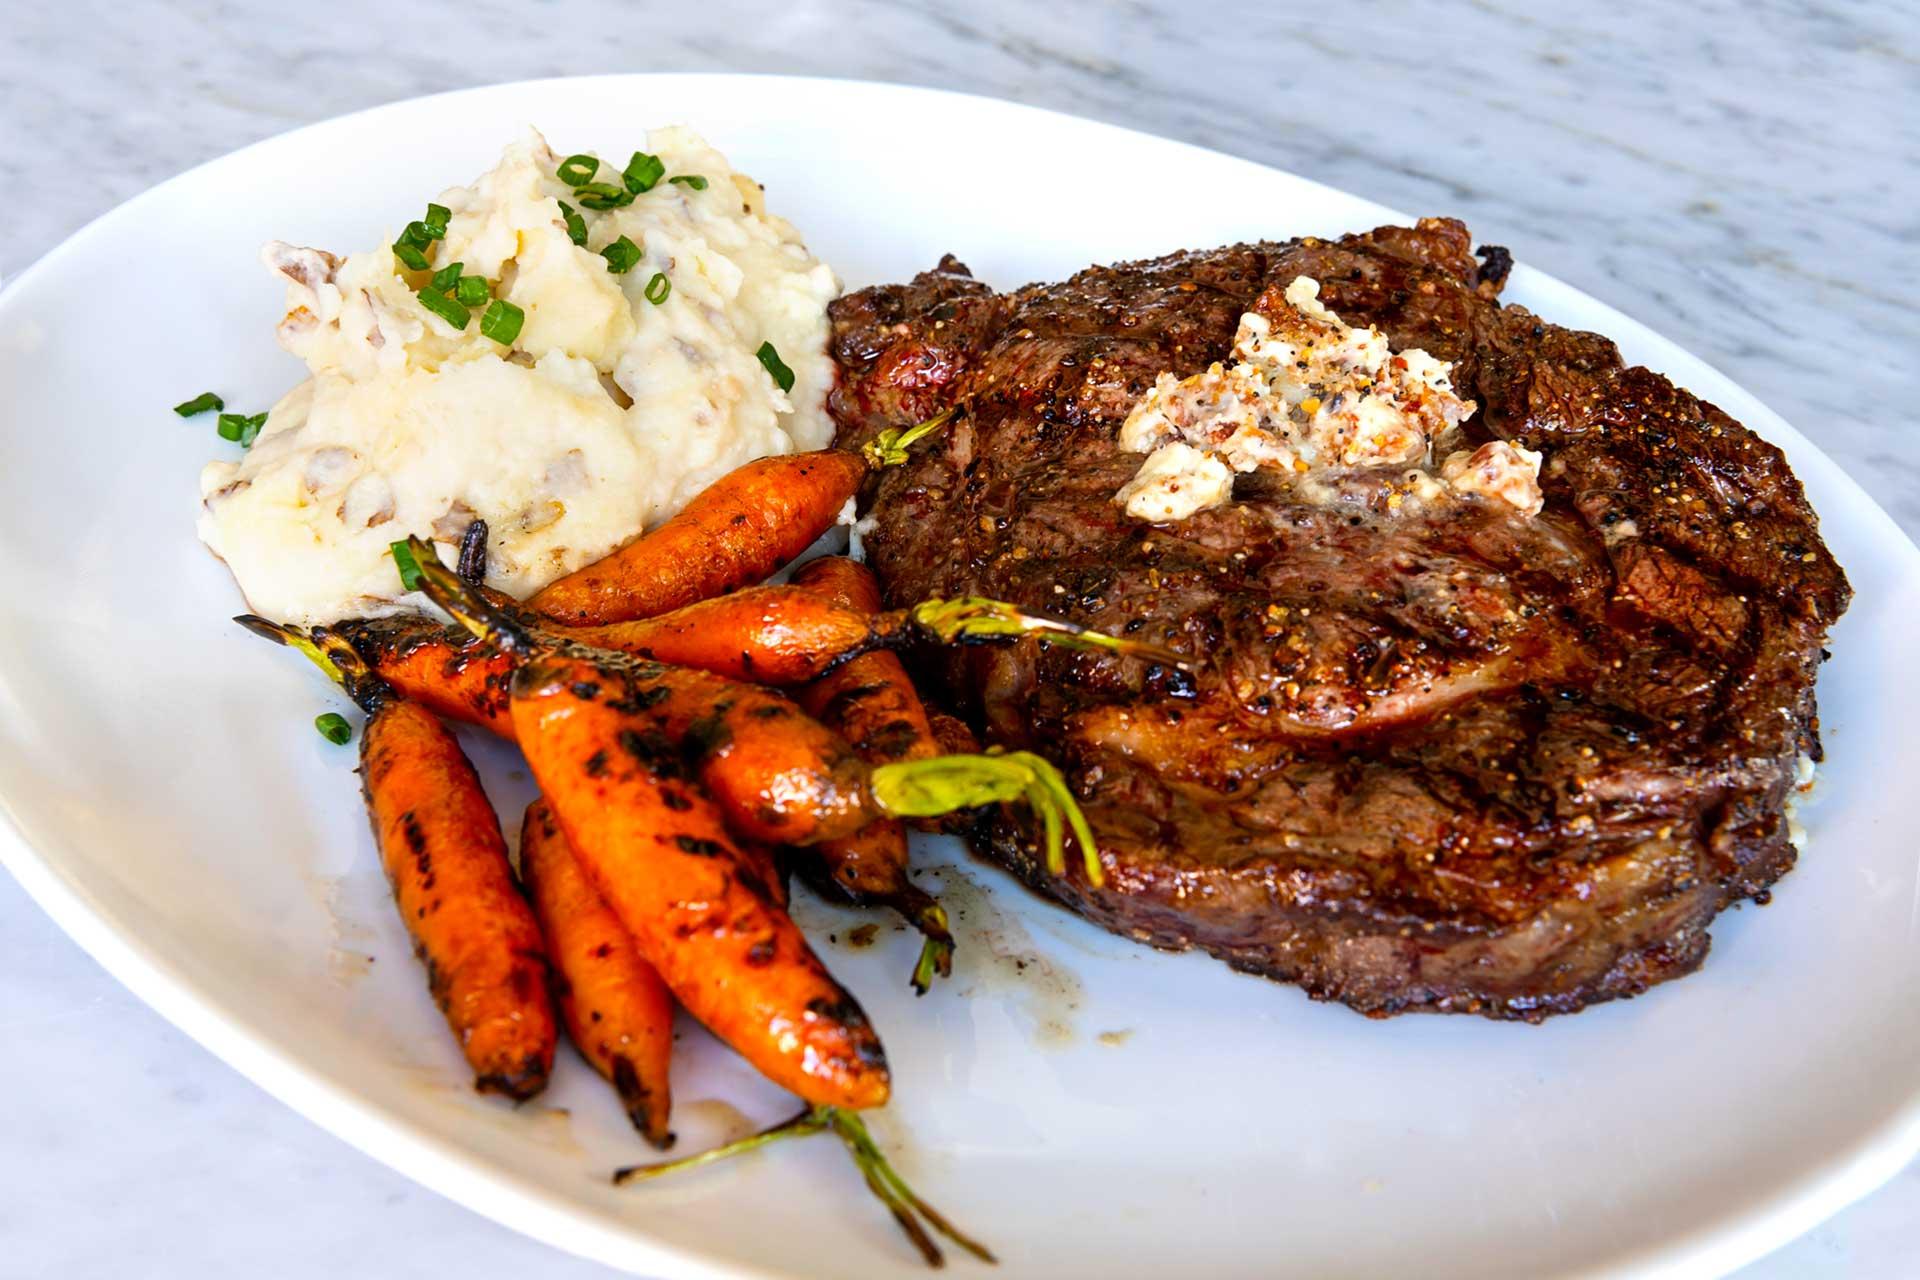 2020 Menu - Steak, Carrots, and Potatoes